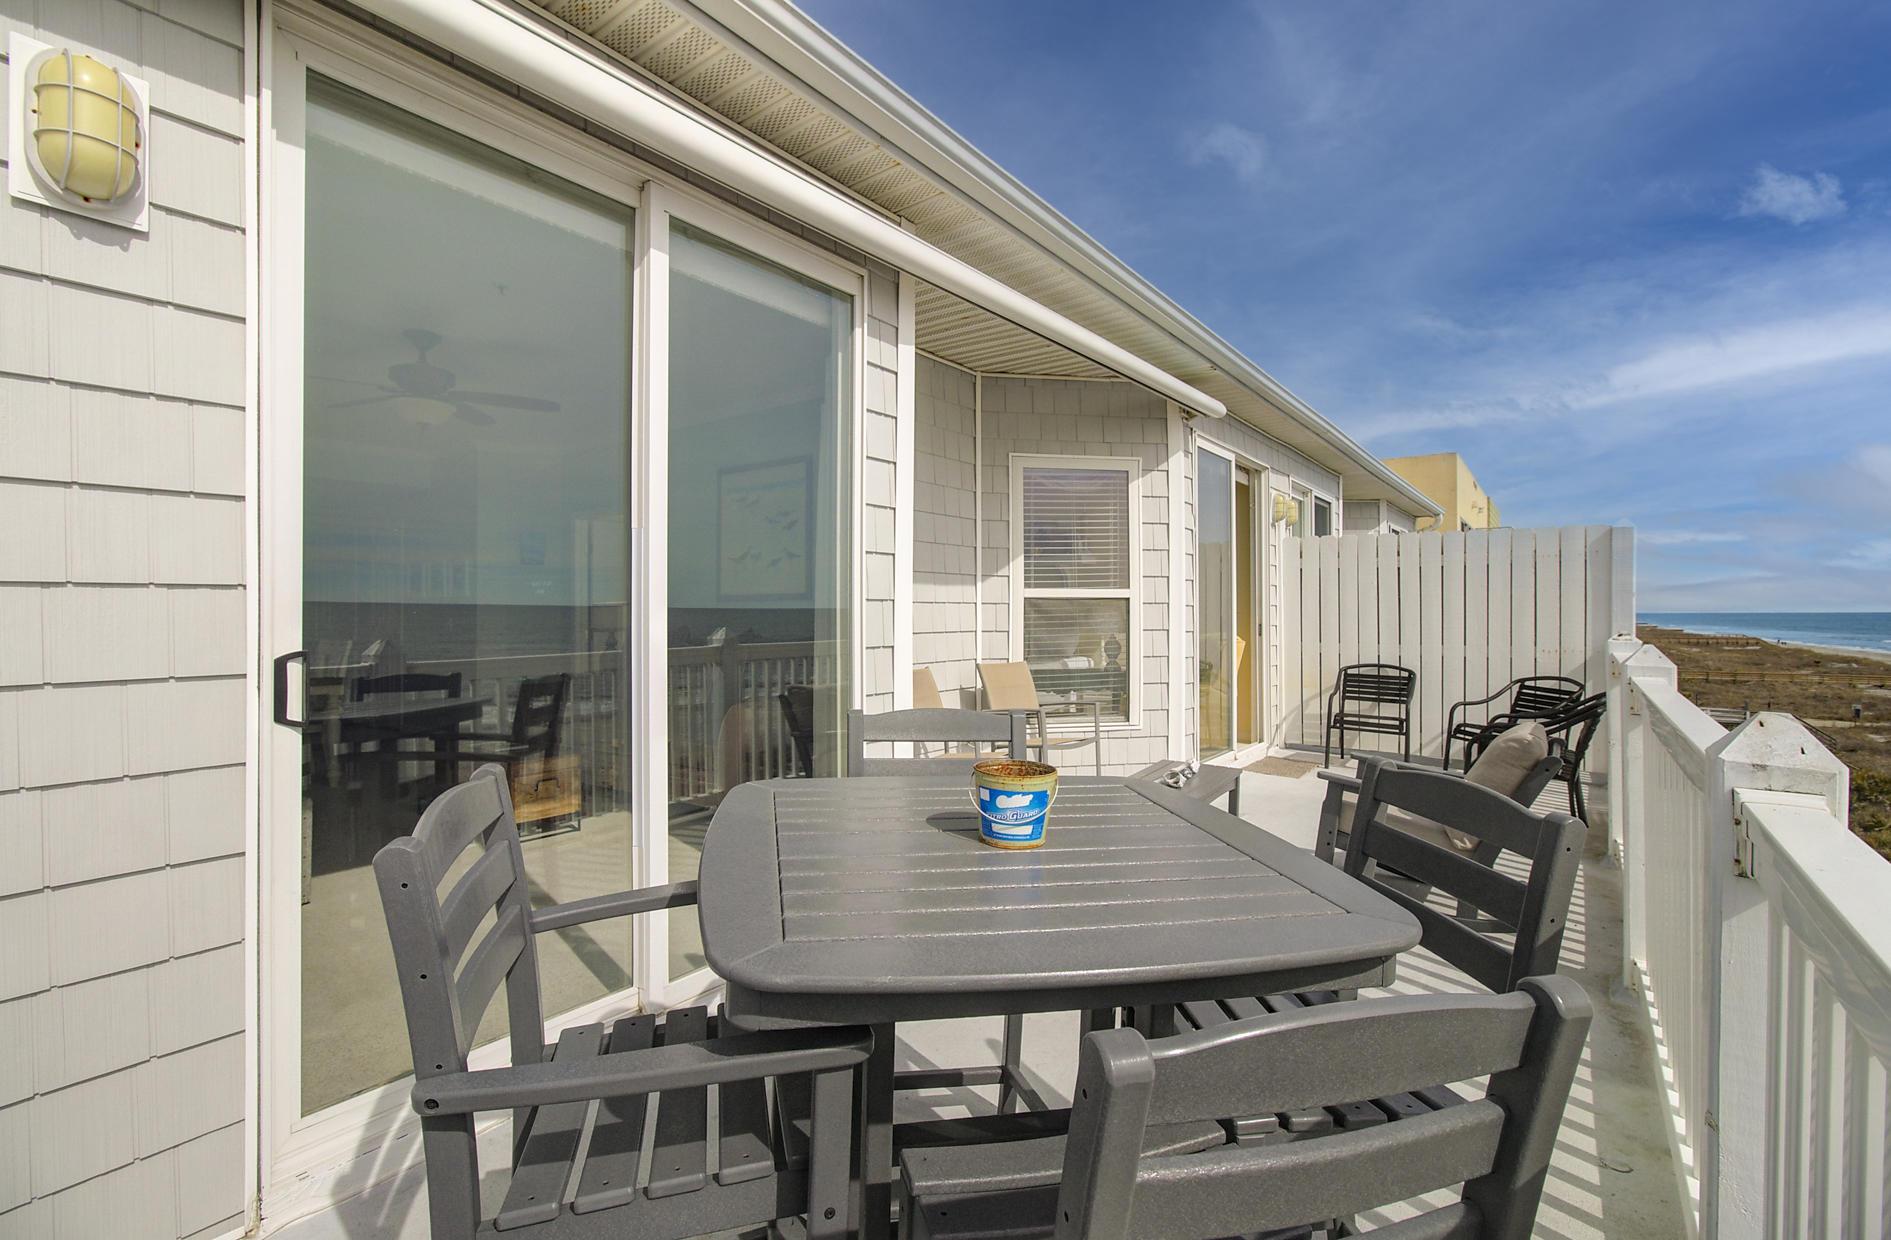 Seaside Villas I Homes For Sale - 111 Arctic, Folly Beach, SC - 26